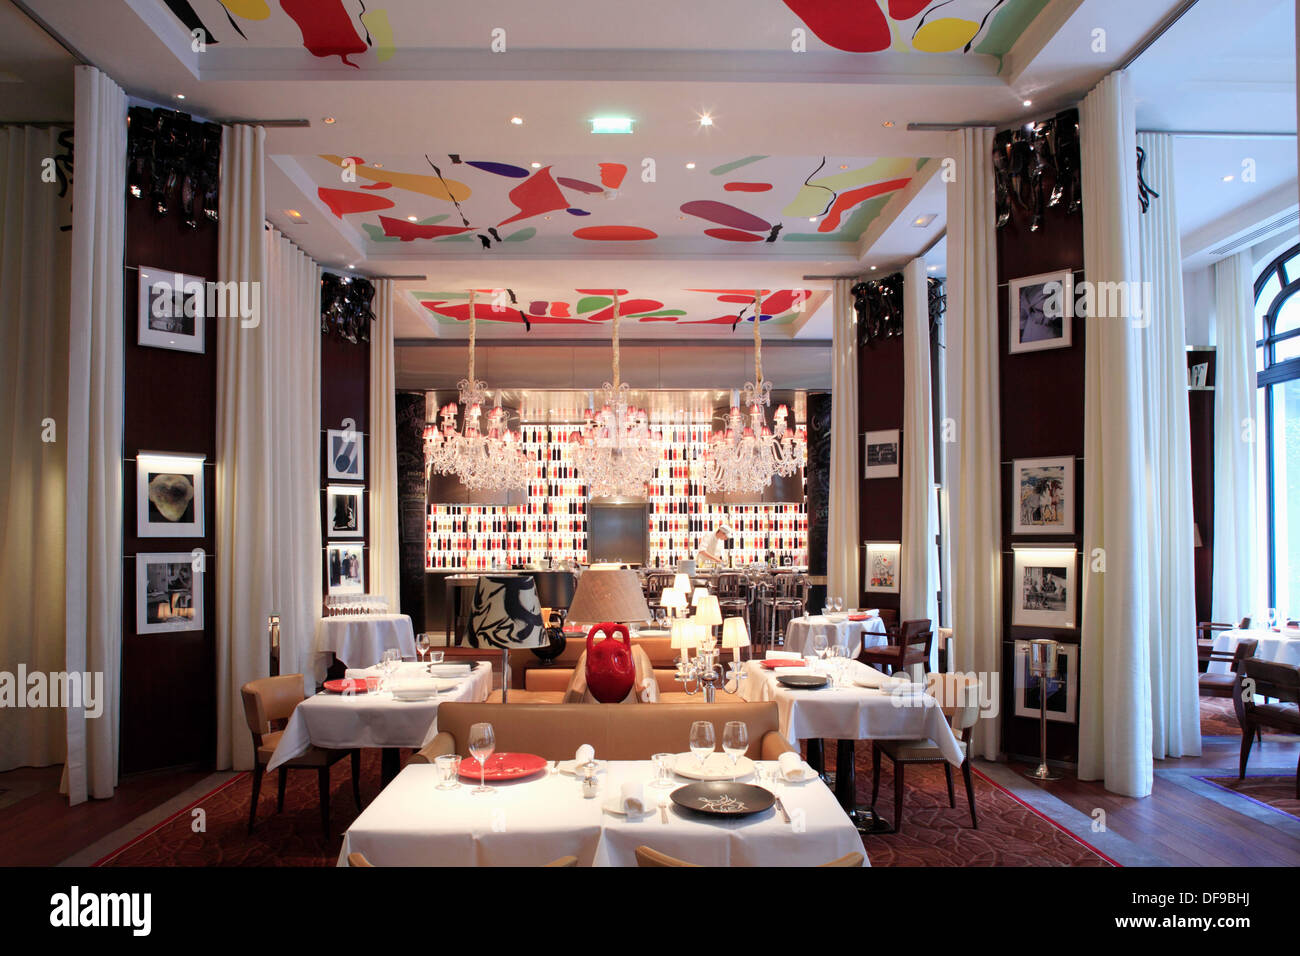 O restaurante La Cuisine desenhado por Philippe Starck no Hotel Le on